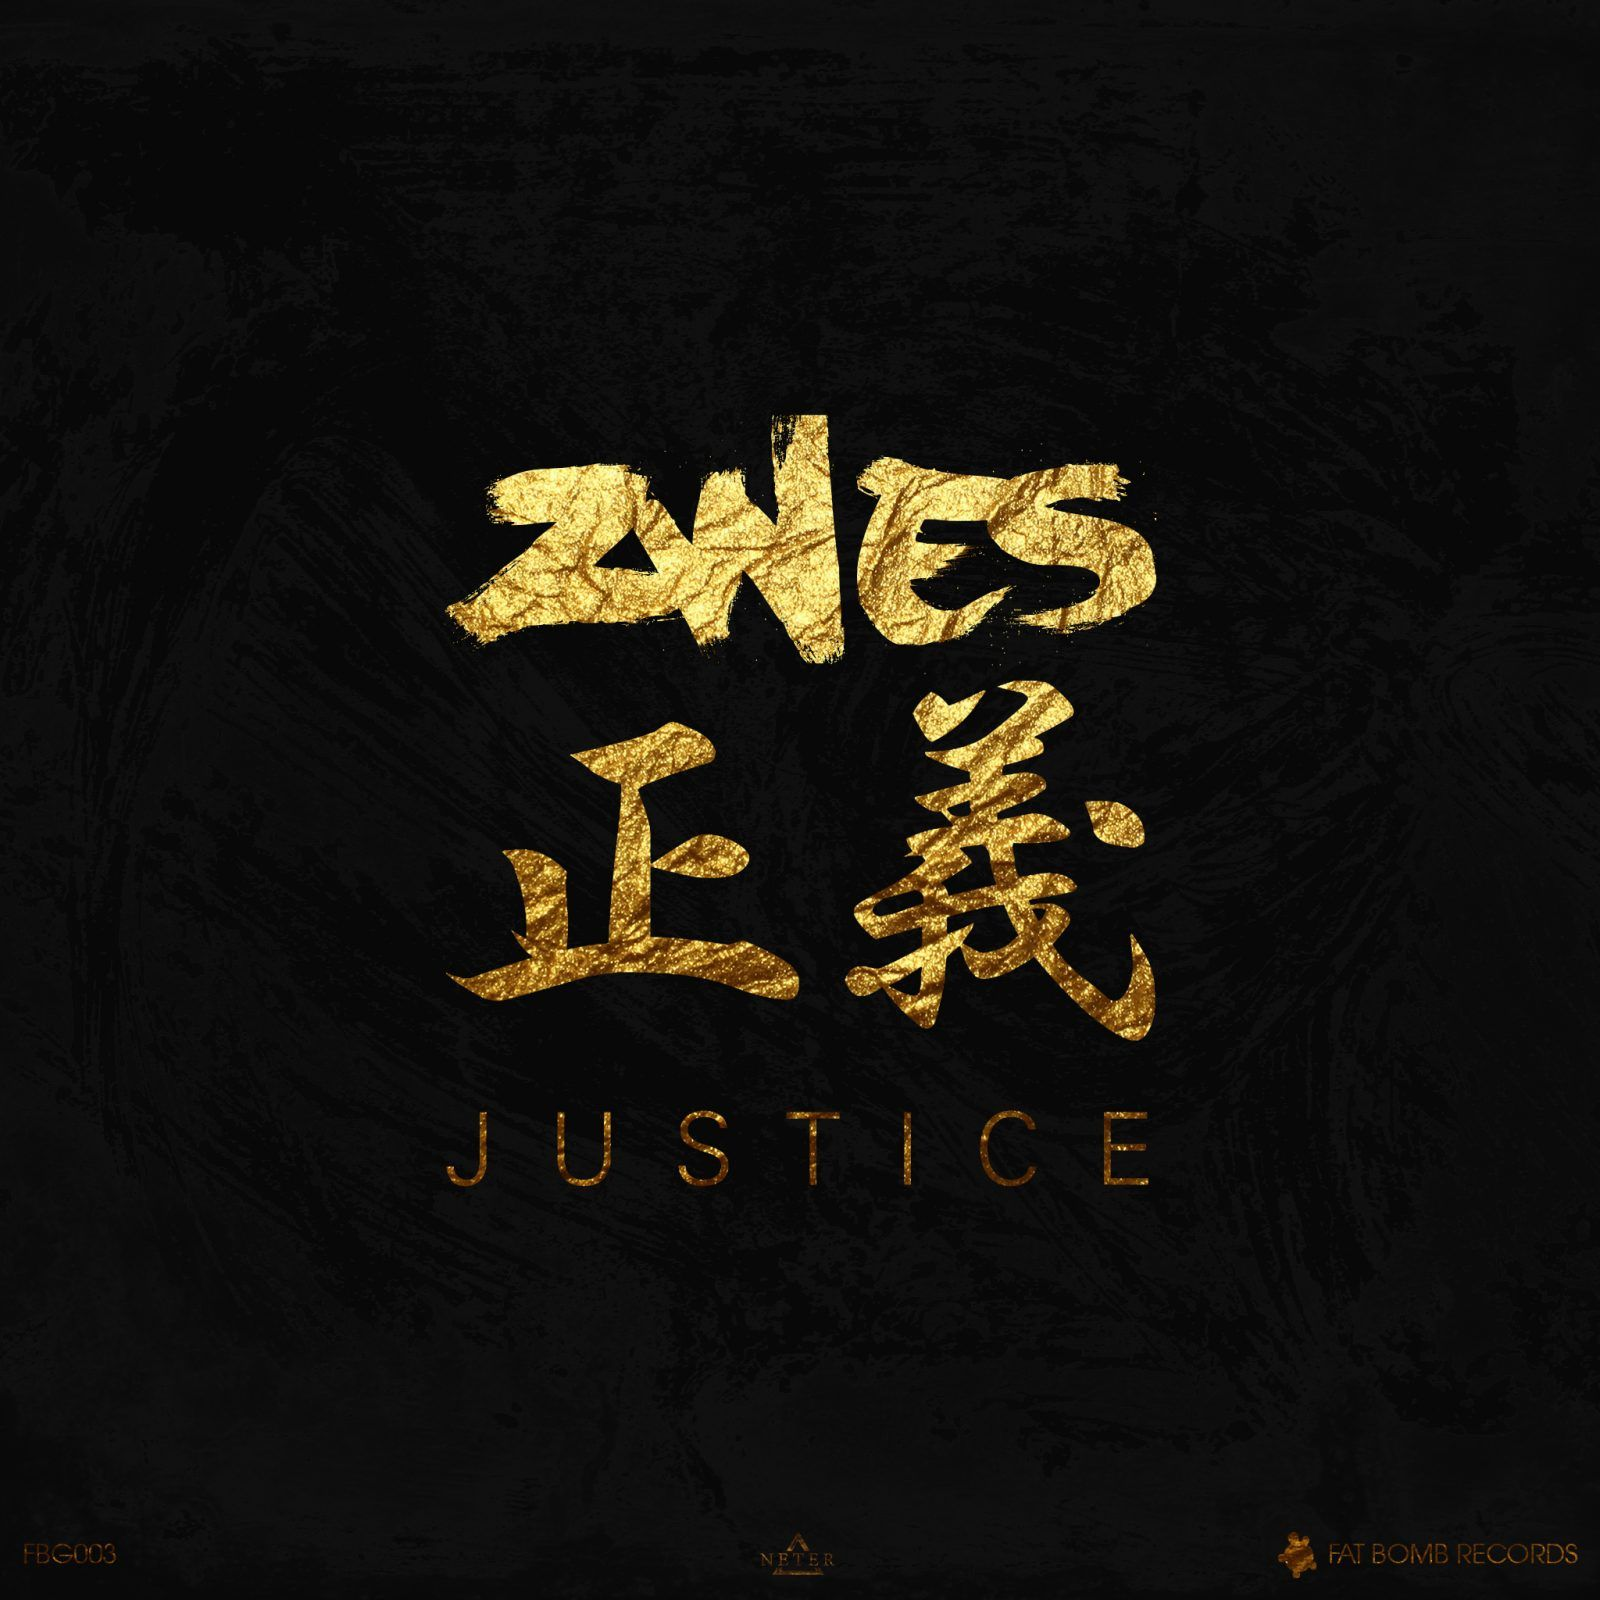 2wes-justice.jpeg